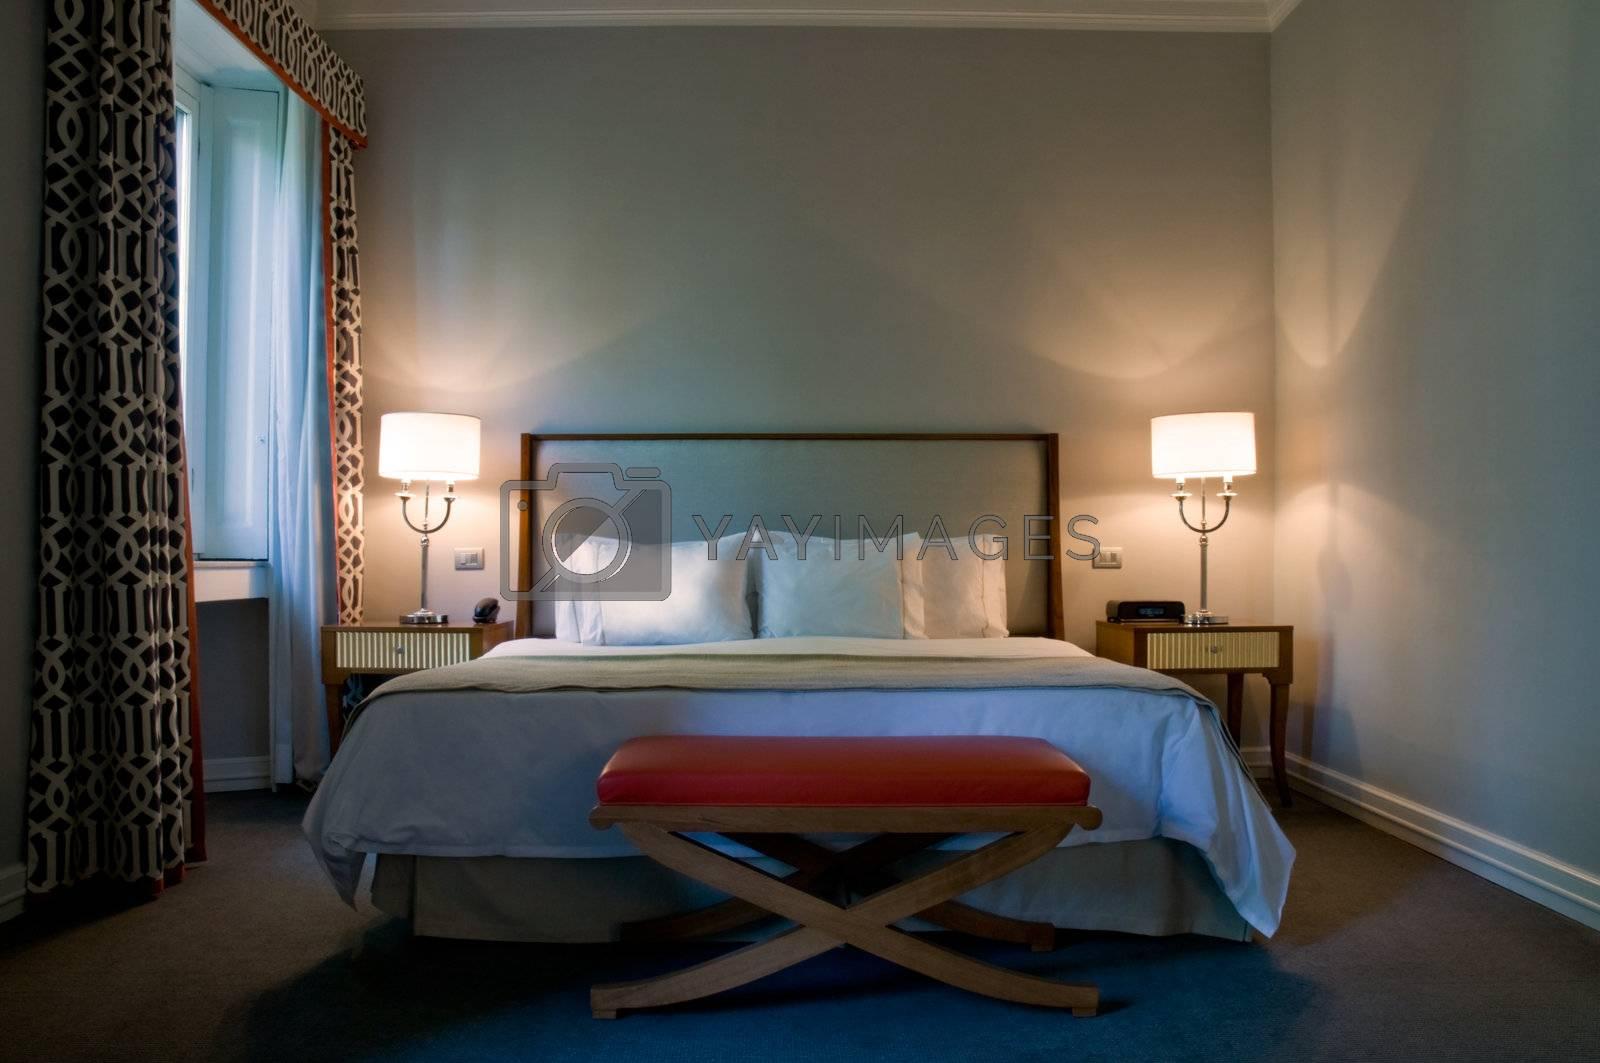 Bedroom of a elegant 5 star hotel suite room